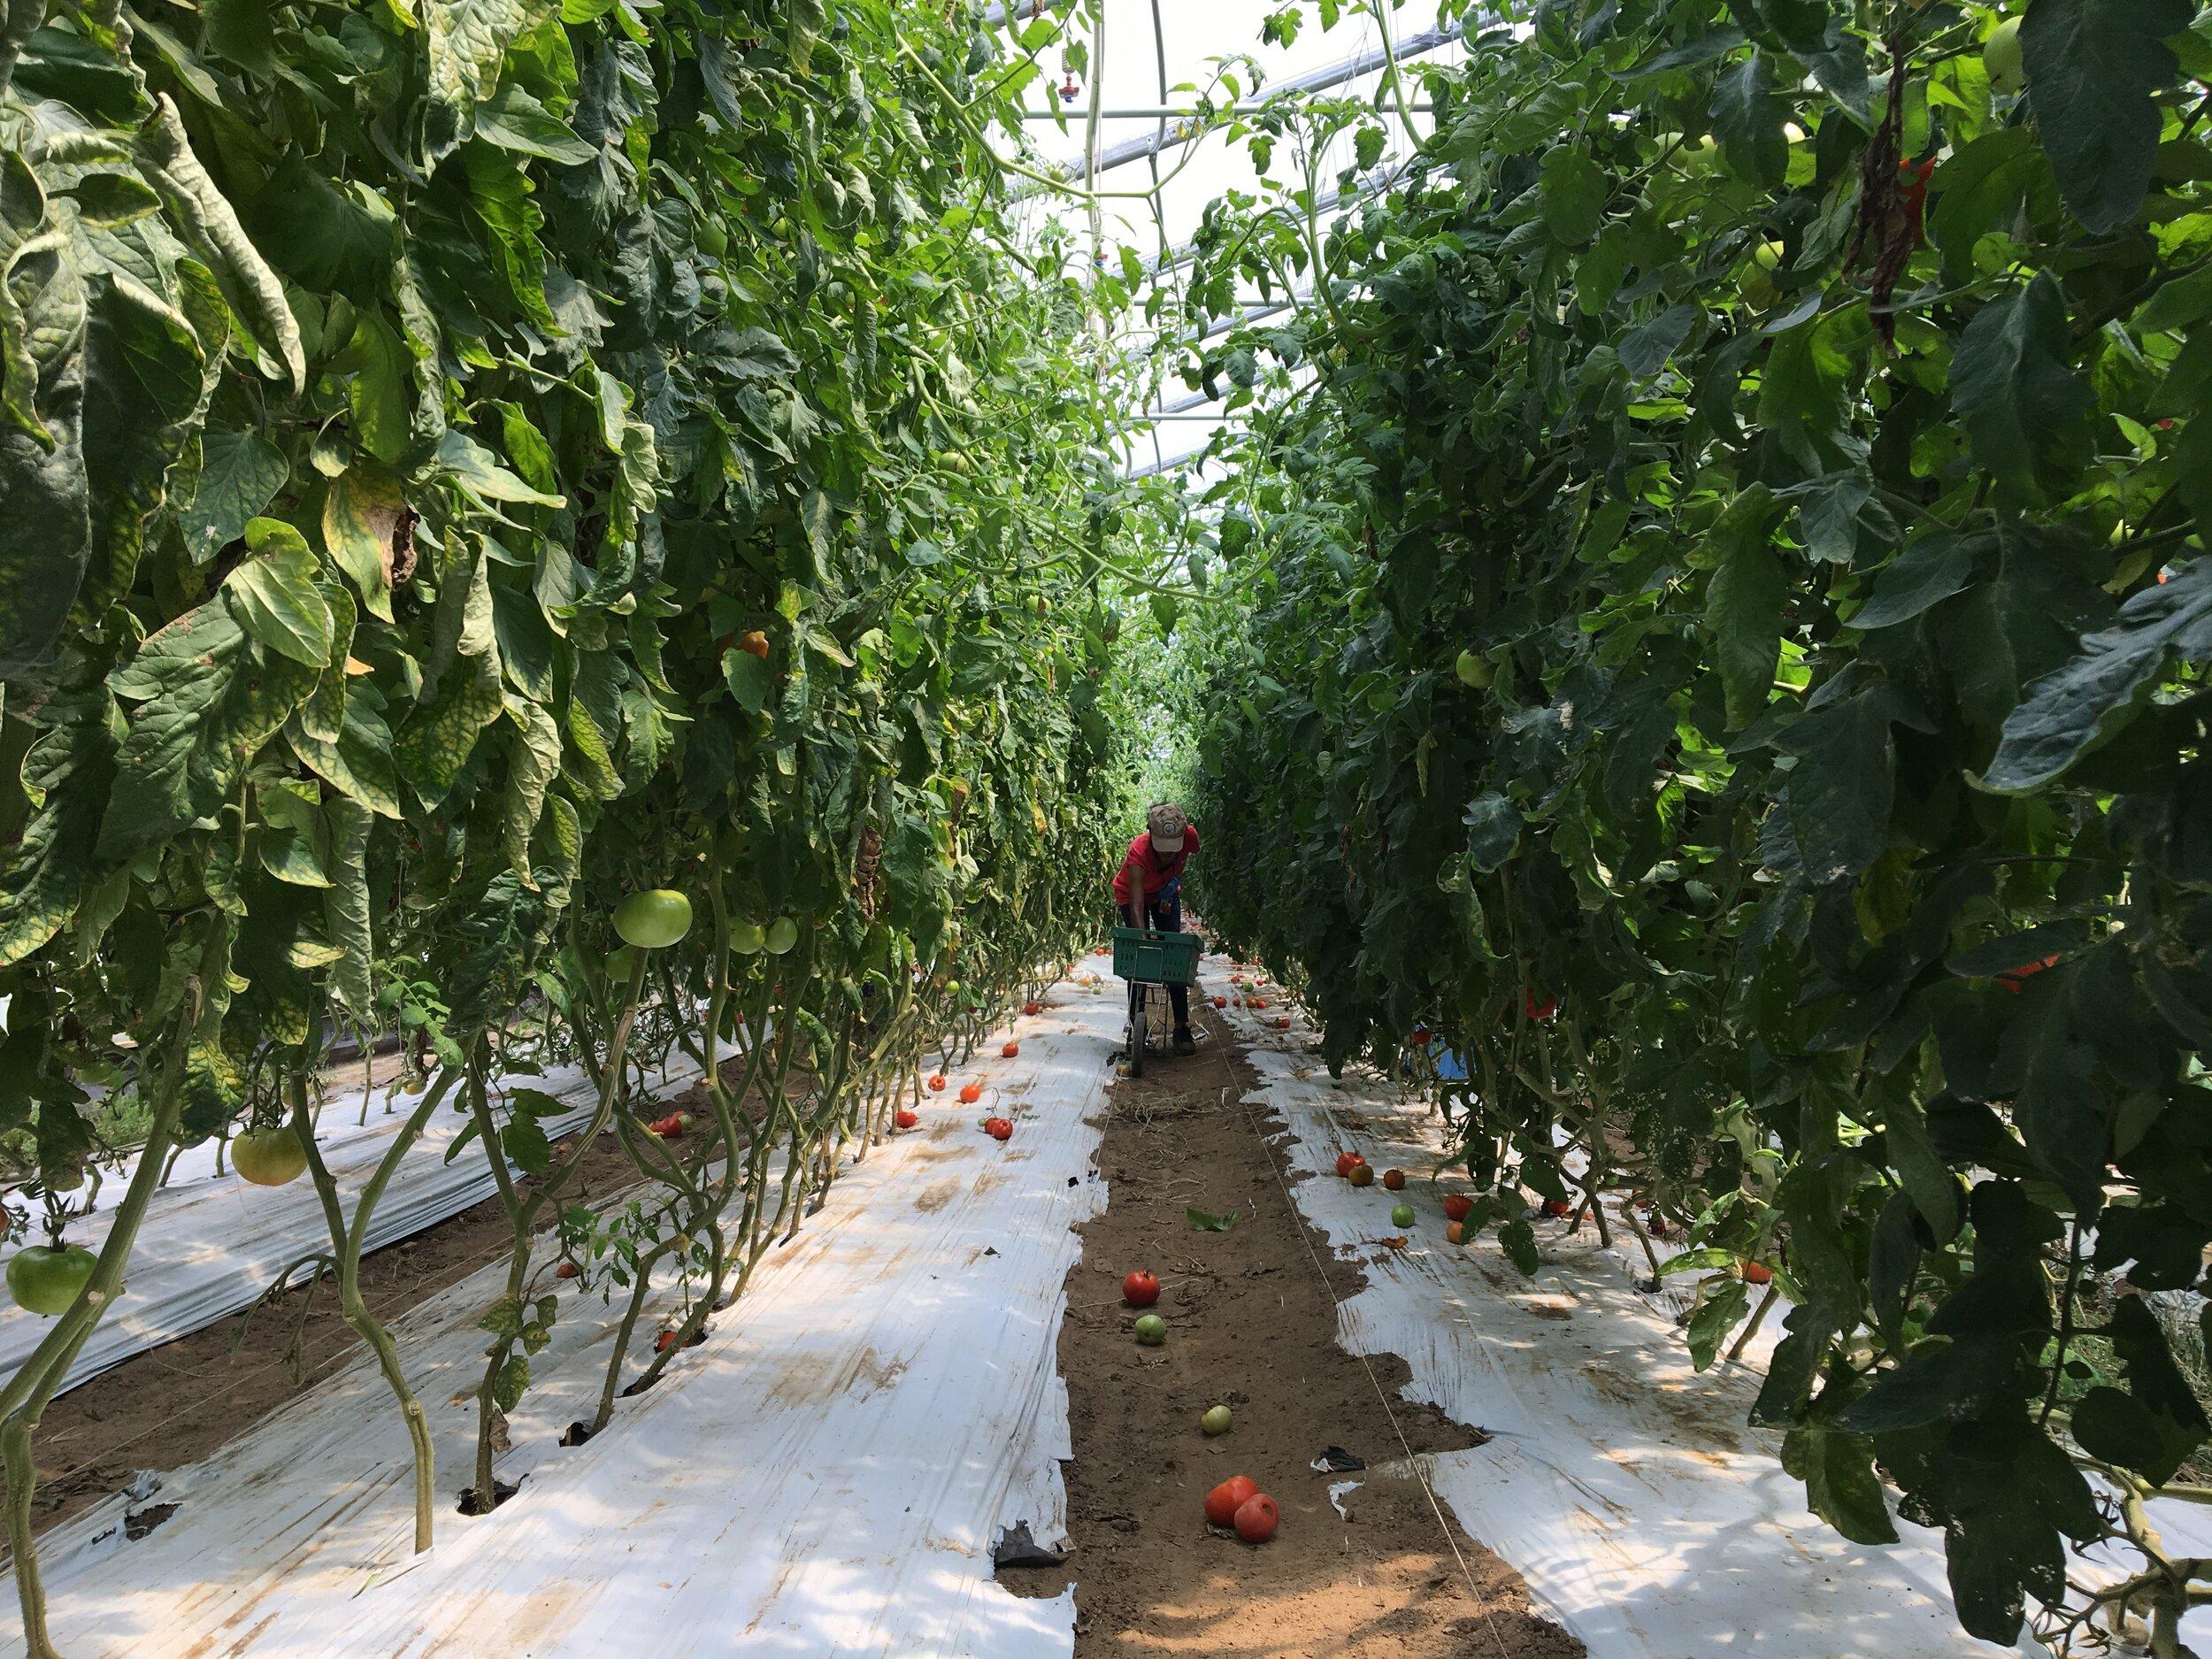 Tunnel Full of Tomato Plants